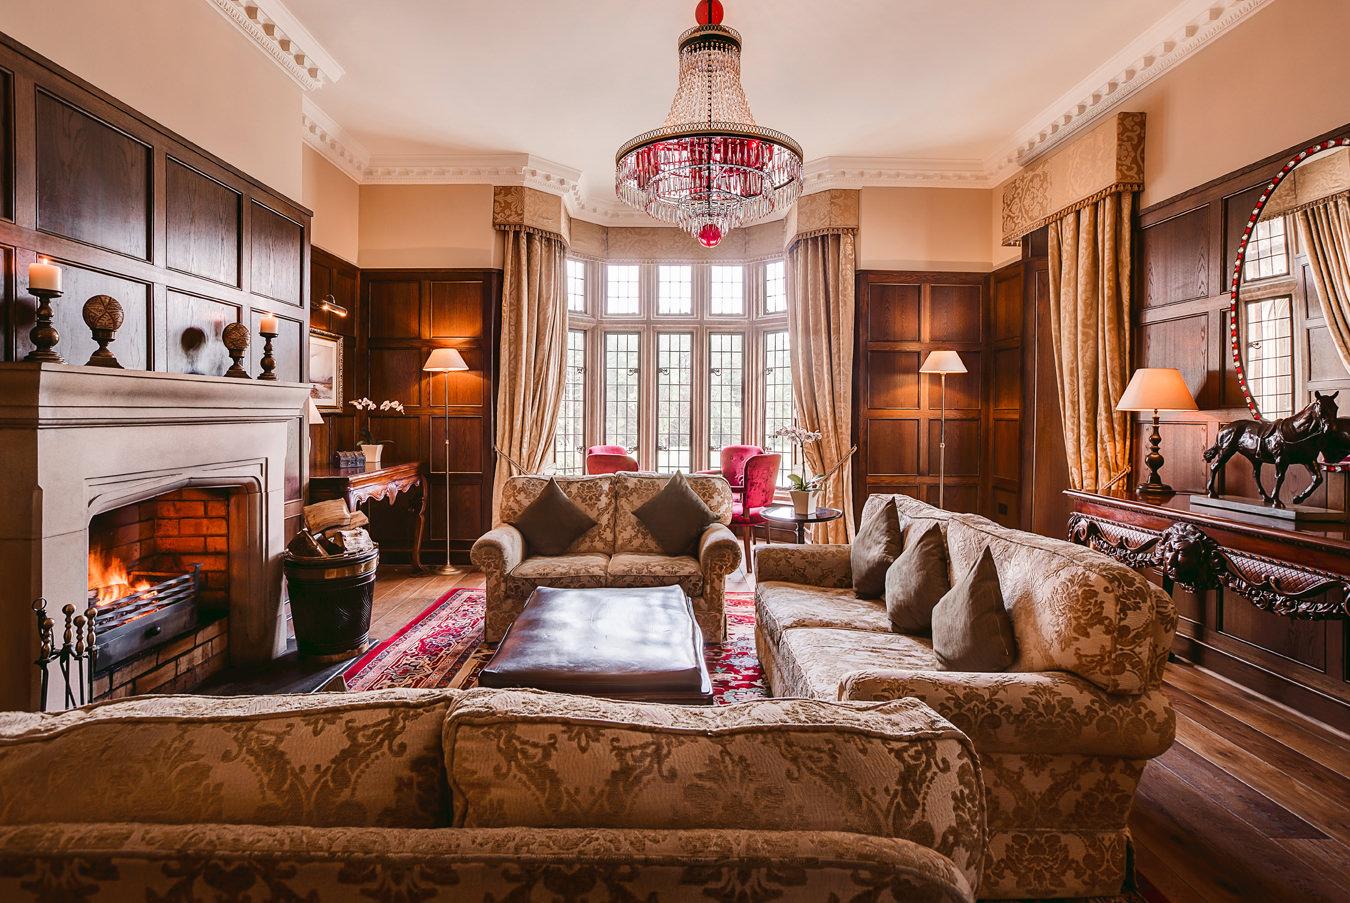 Lough eske castle special offers